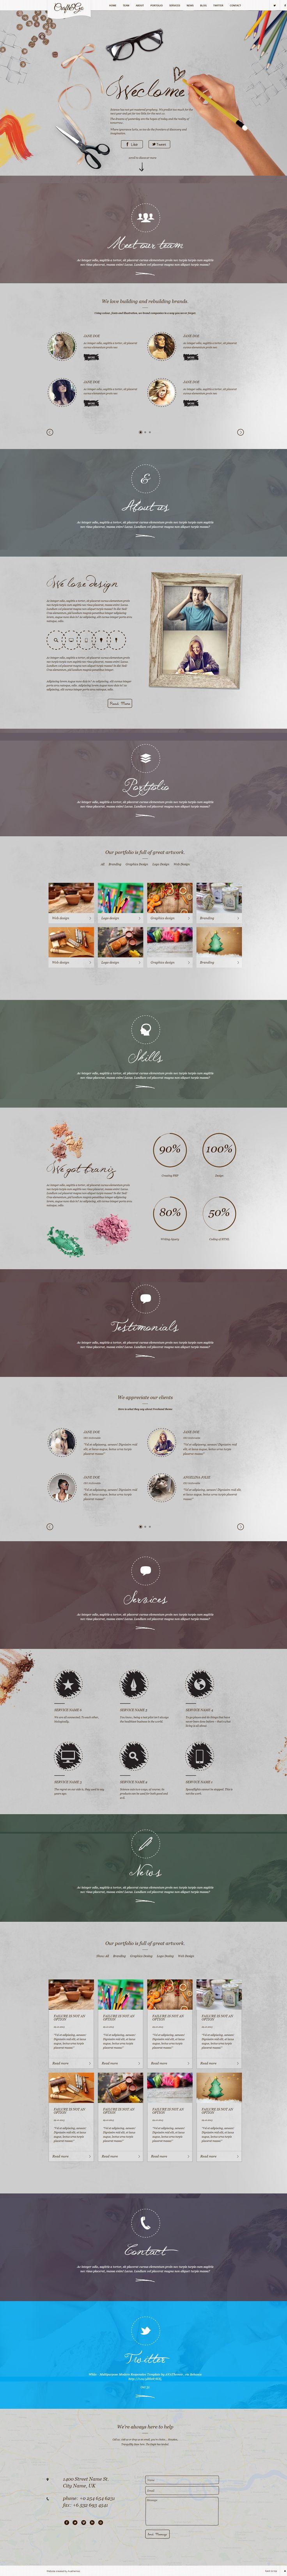 Craft&Go - Parallax OnePage Modern WordPress Theme http://themeforest.net/item/craftgo-parallax-onepage-modern-wordpress-theme/6073928?ref=wpaw #wordpress #web #design